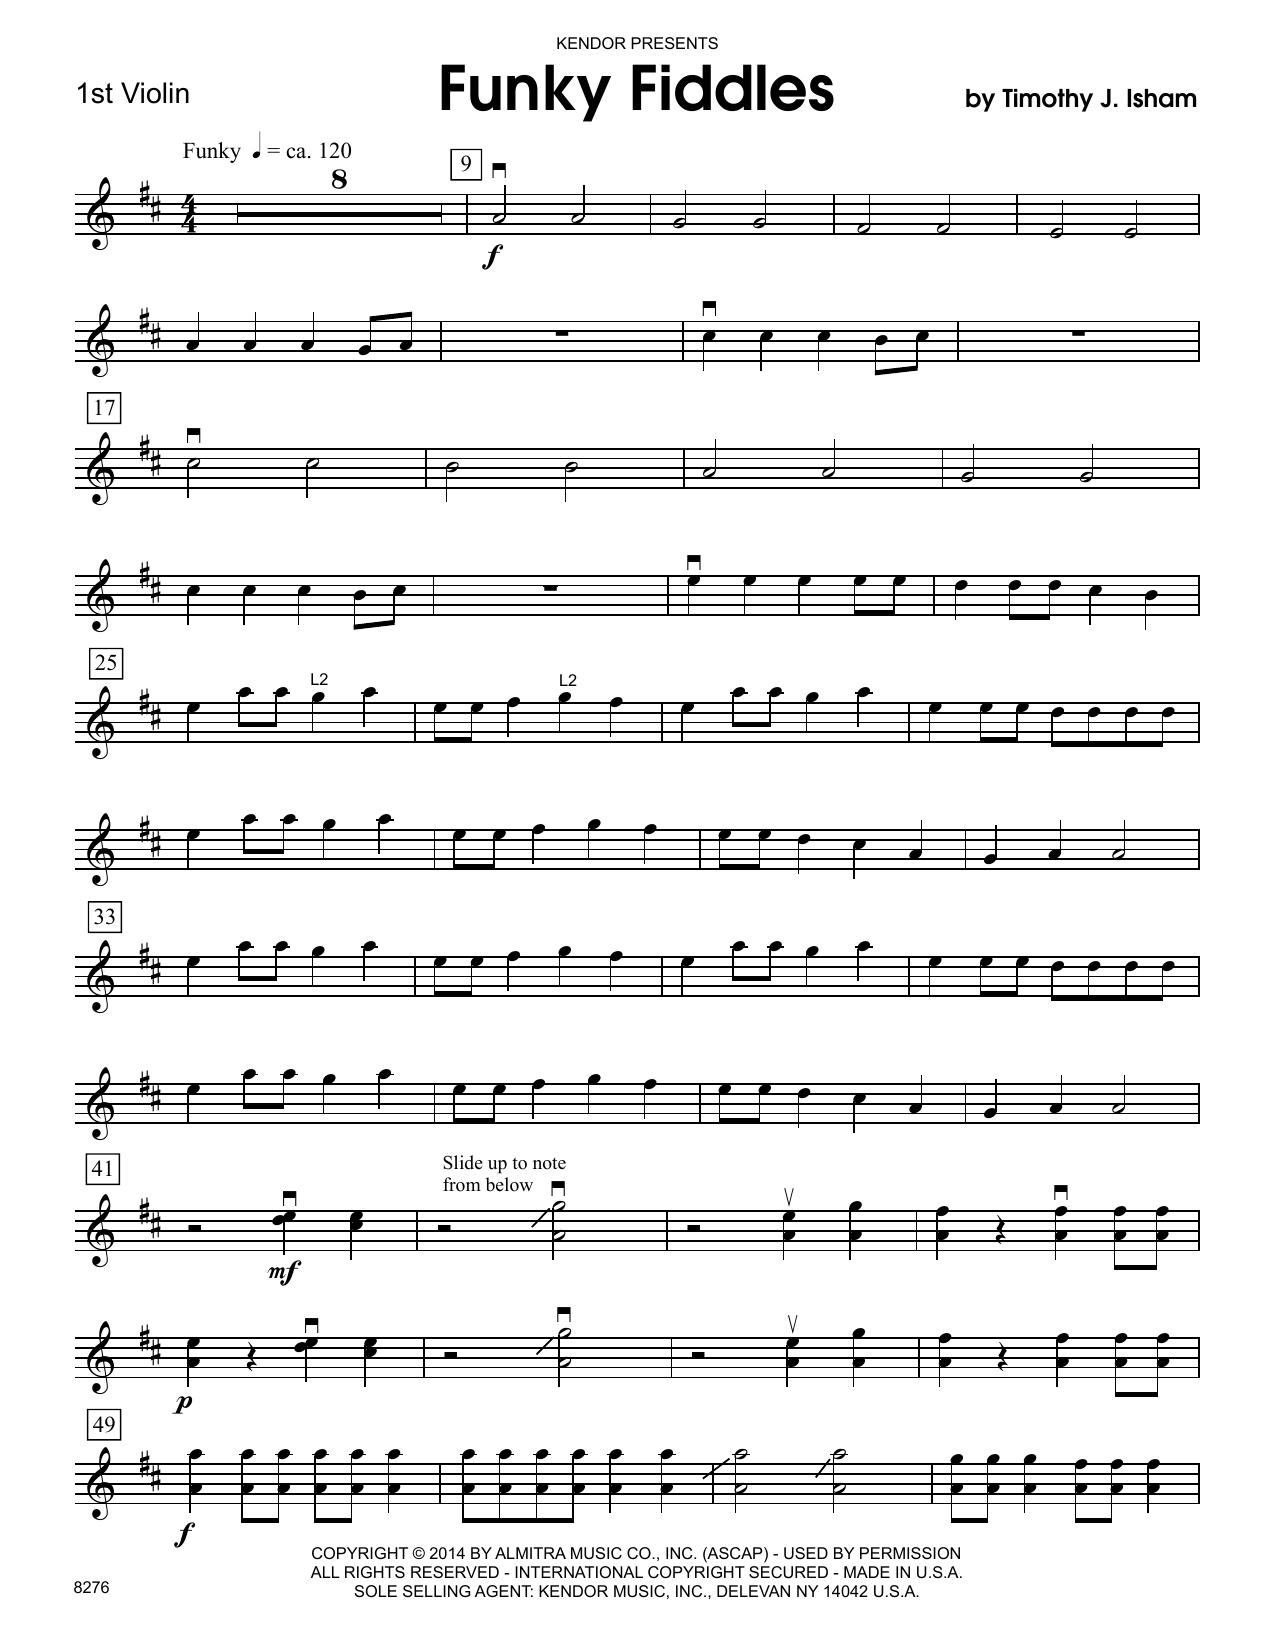 Funky Fiddles - 1st Violin Sheet Music